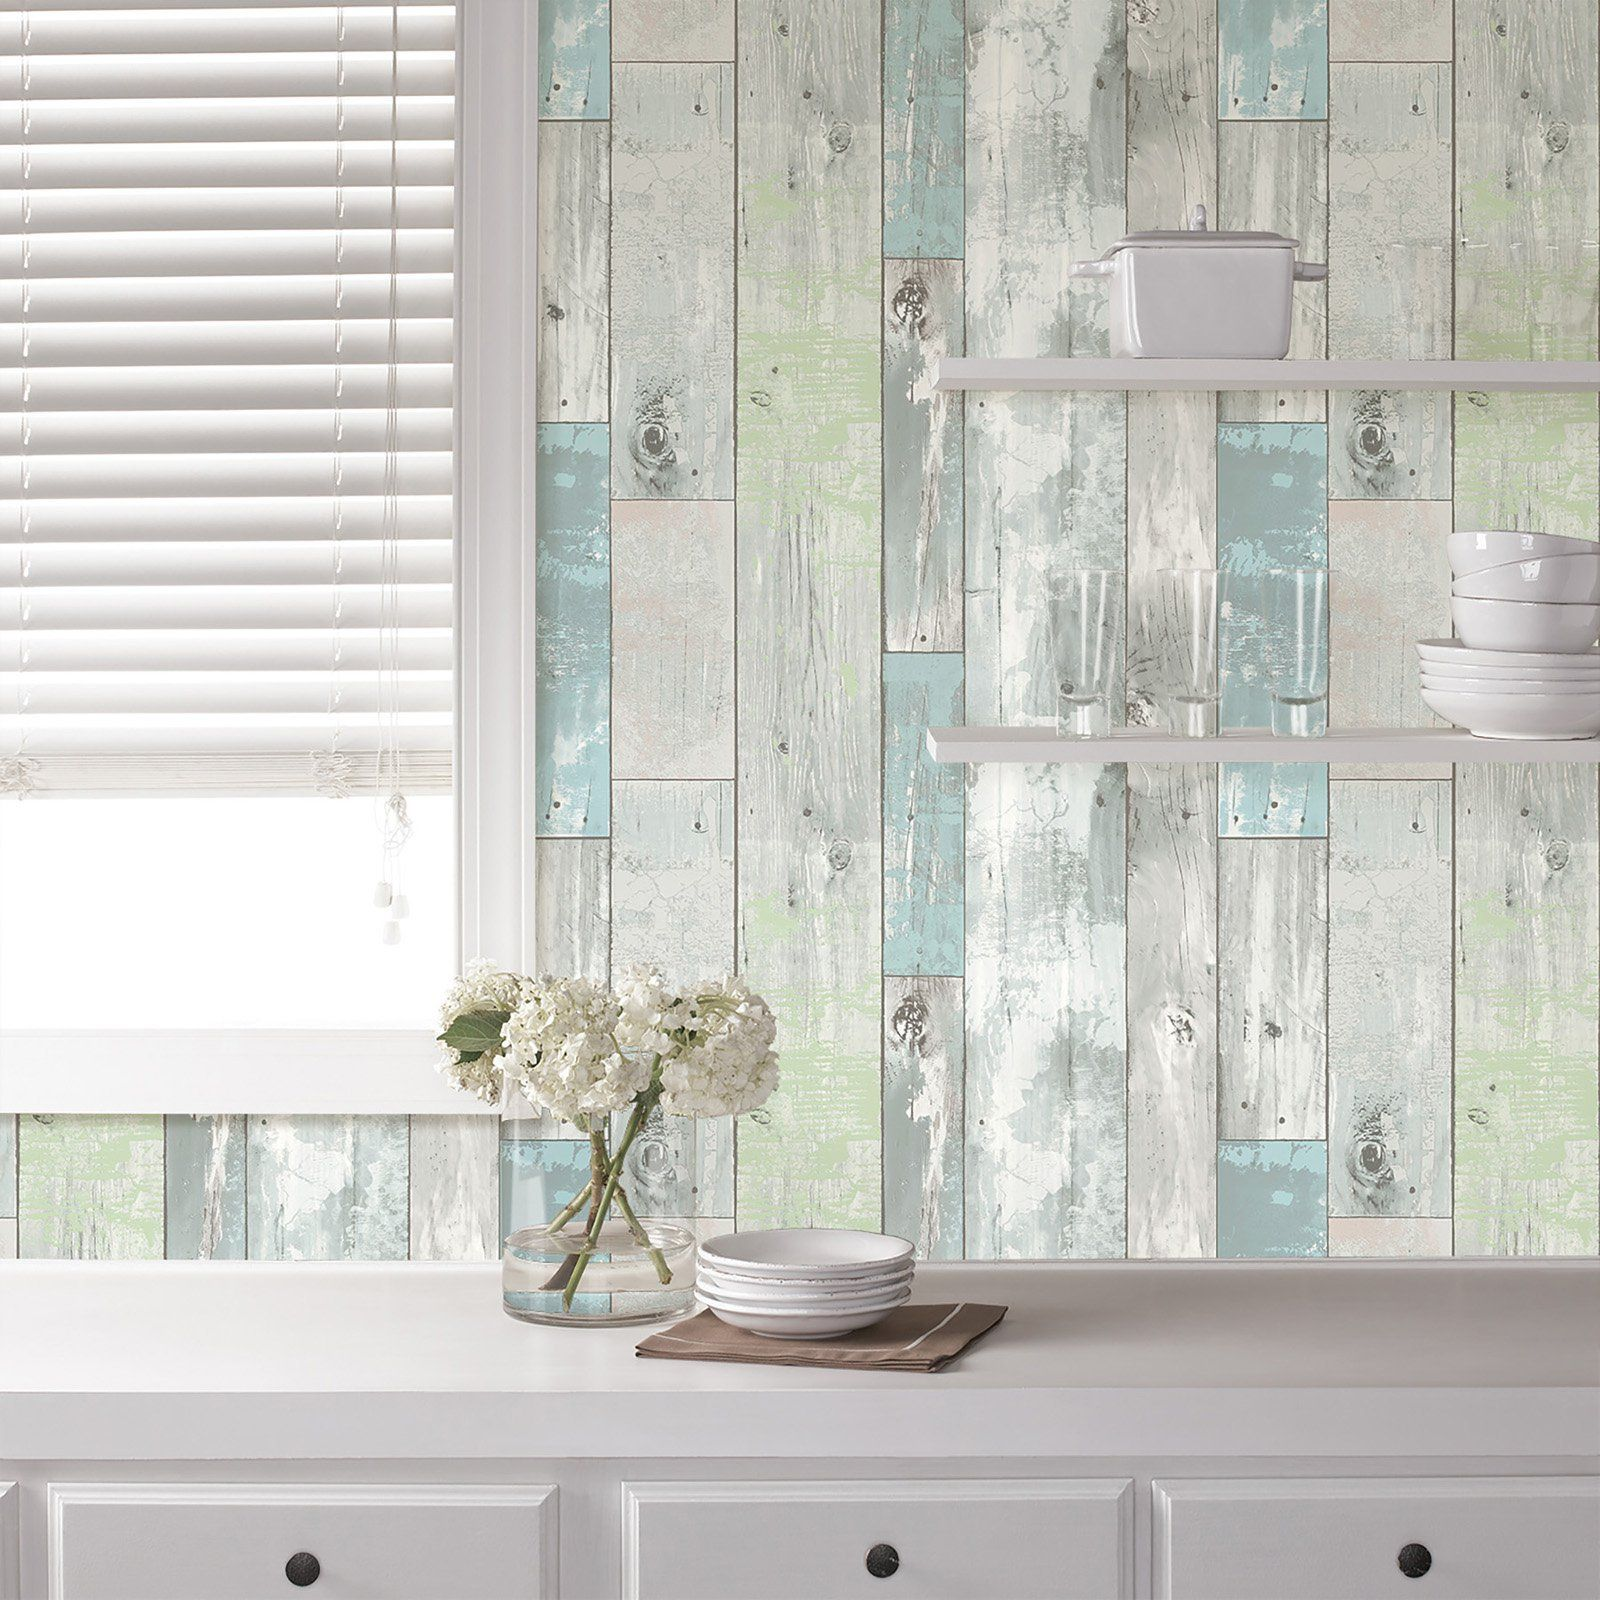 Nuwallpaper Beachwood Peel Stick Wallpaper Walmart Com In 2021 Peel And Stick Wallpaper Nuwallpaper Simple Wallpapers